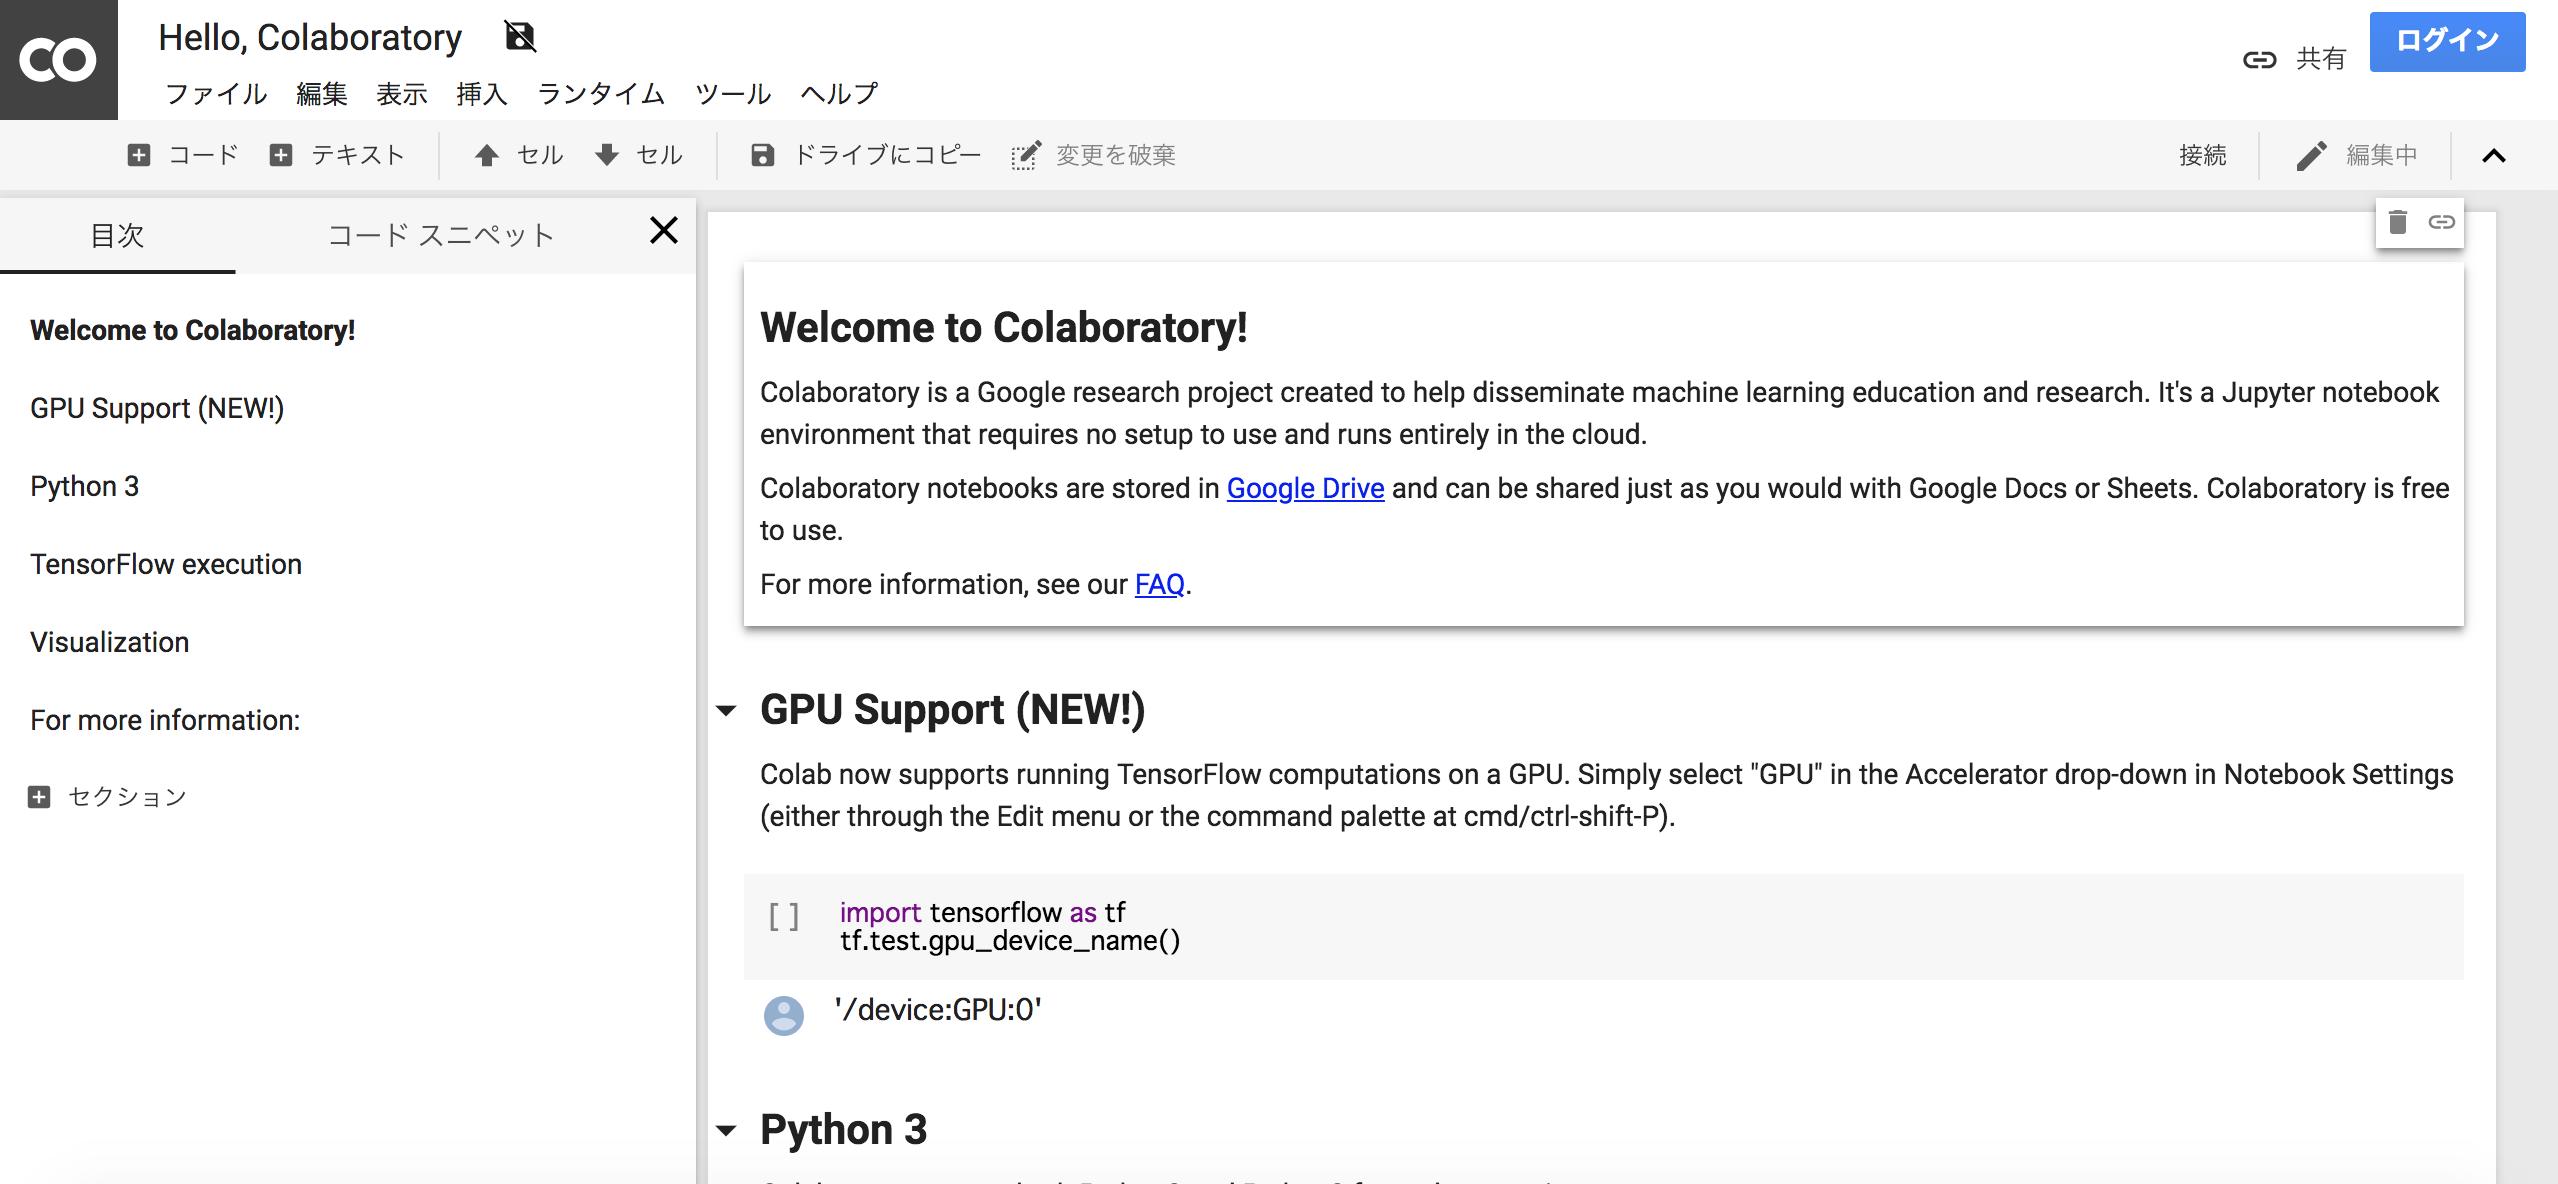 Google Colab Cv2 Imshow